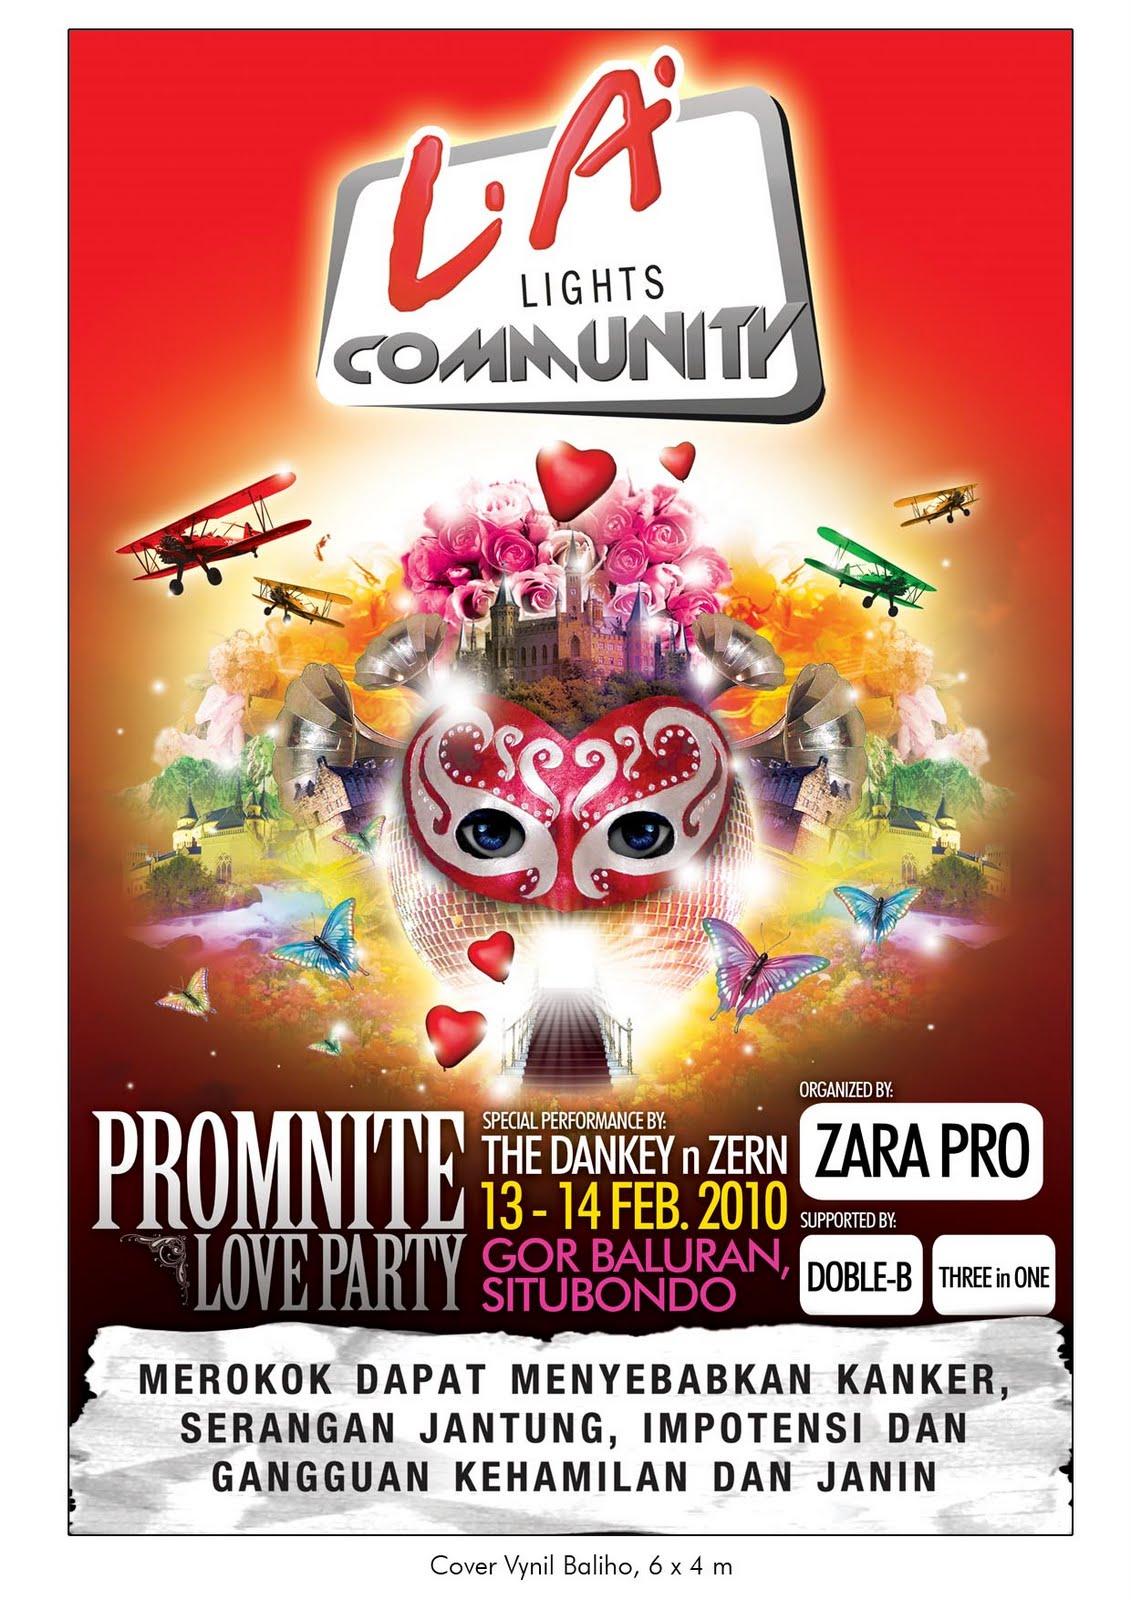 http://2.bp.blogspot.com/_rbh_nTLcOM8/TAhfOOsH-cI/AAAAAAAAACg/EsLC-M8L7fs/s1600/Baliho+Promnite+Love+Party+%28Situbondo%29.jpg